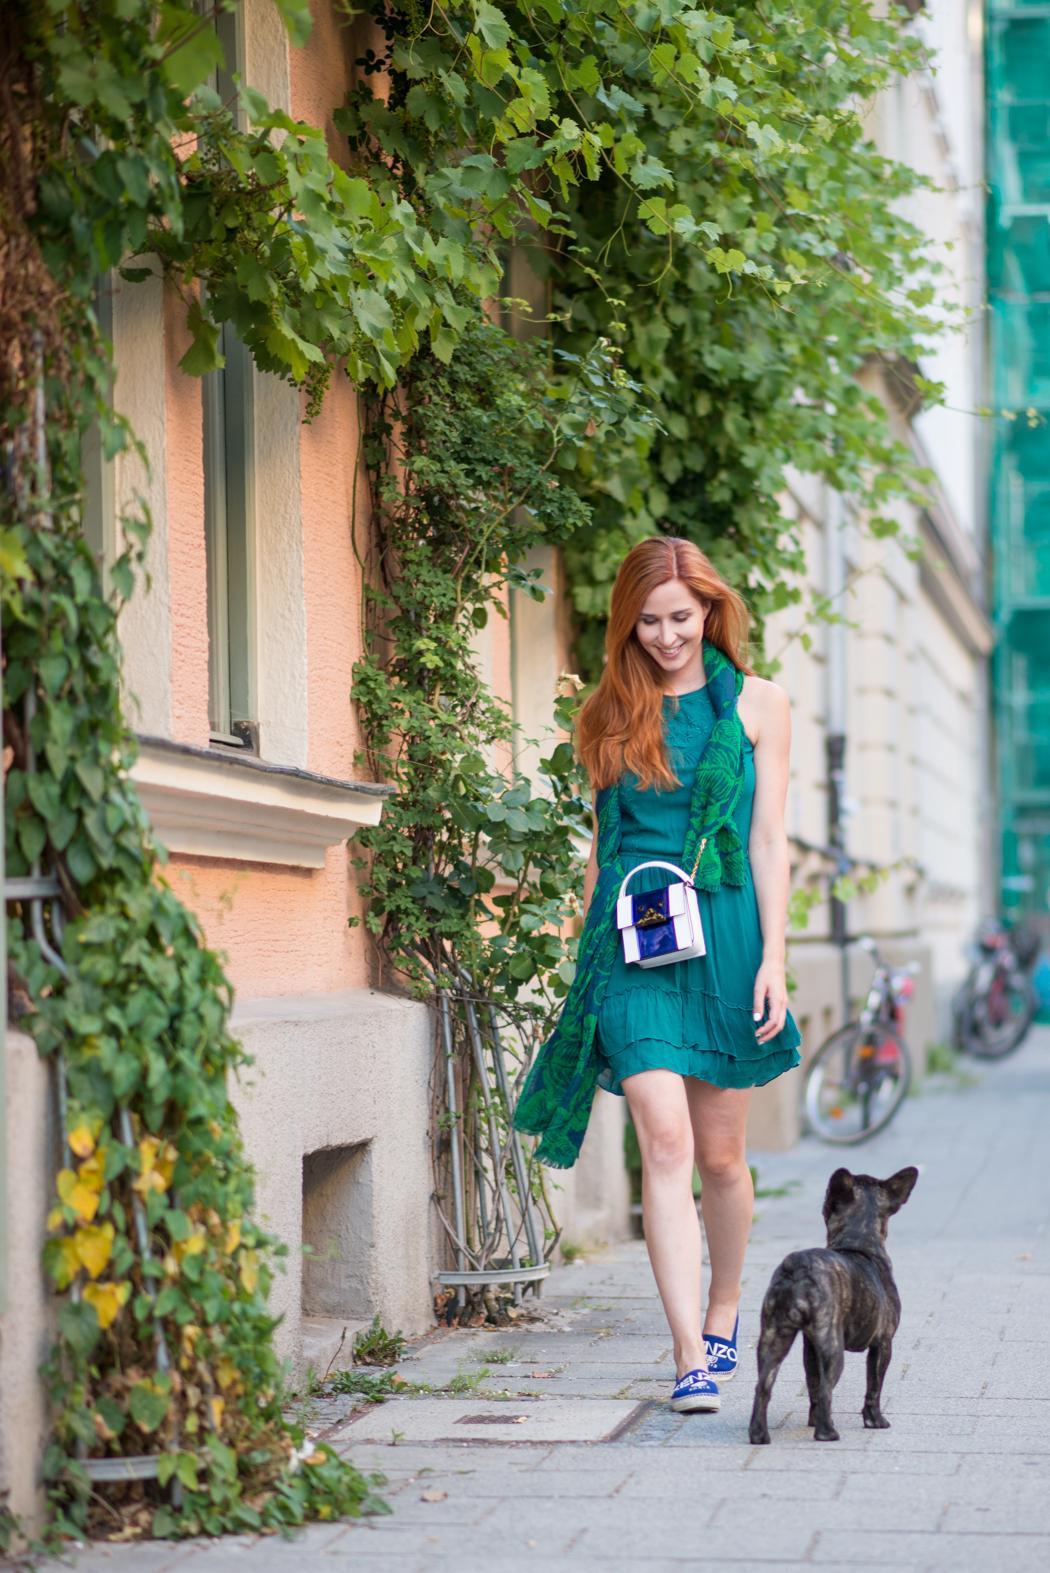 Fashionblog-Fashionblogger-Fashion-Blog-Lifestyle-München-Deutschland-Lindarella-Linda-Rella-1